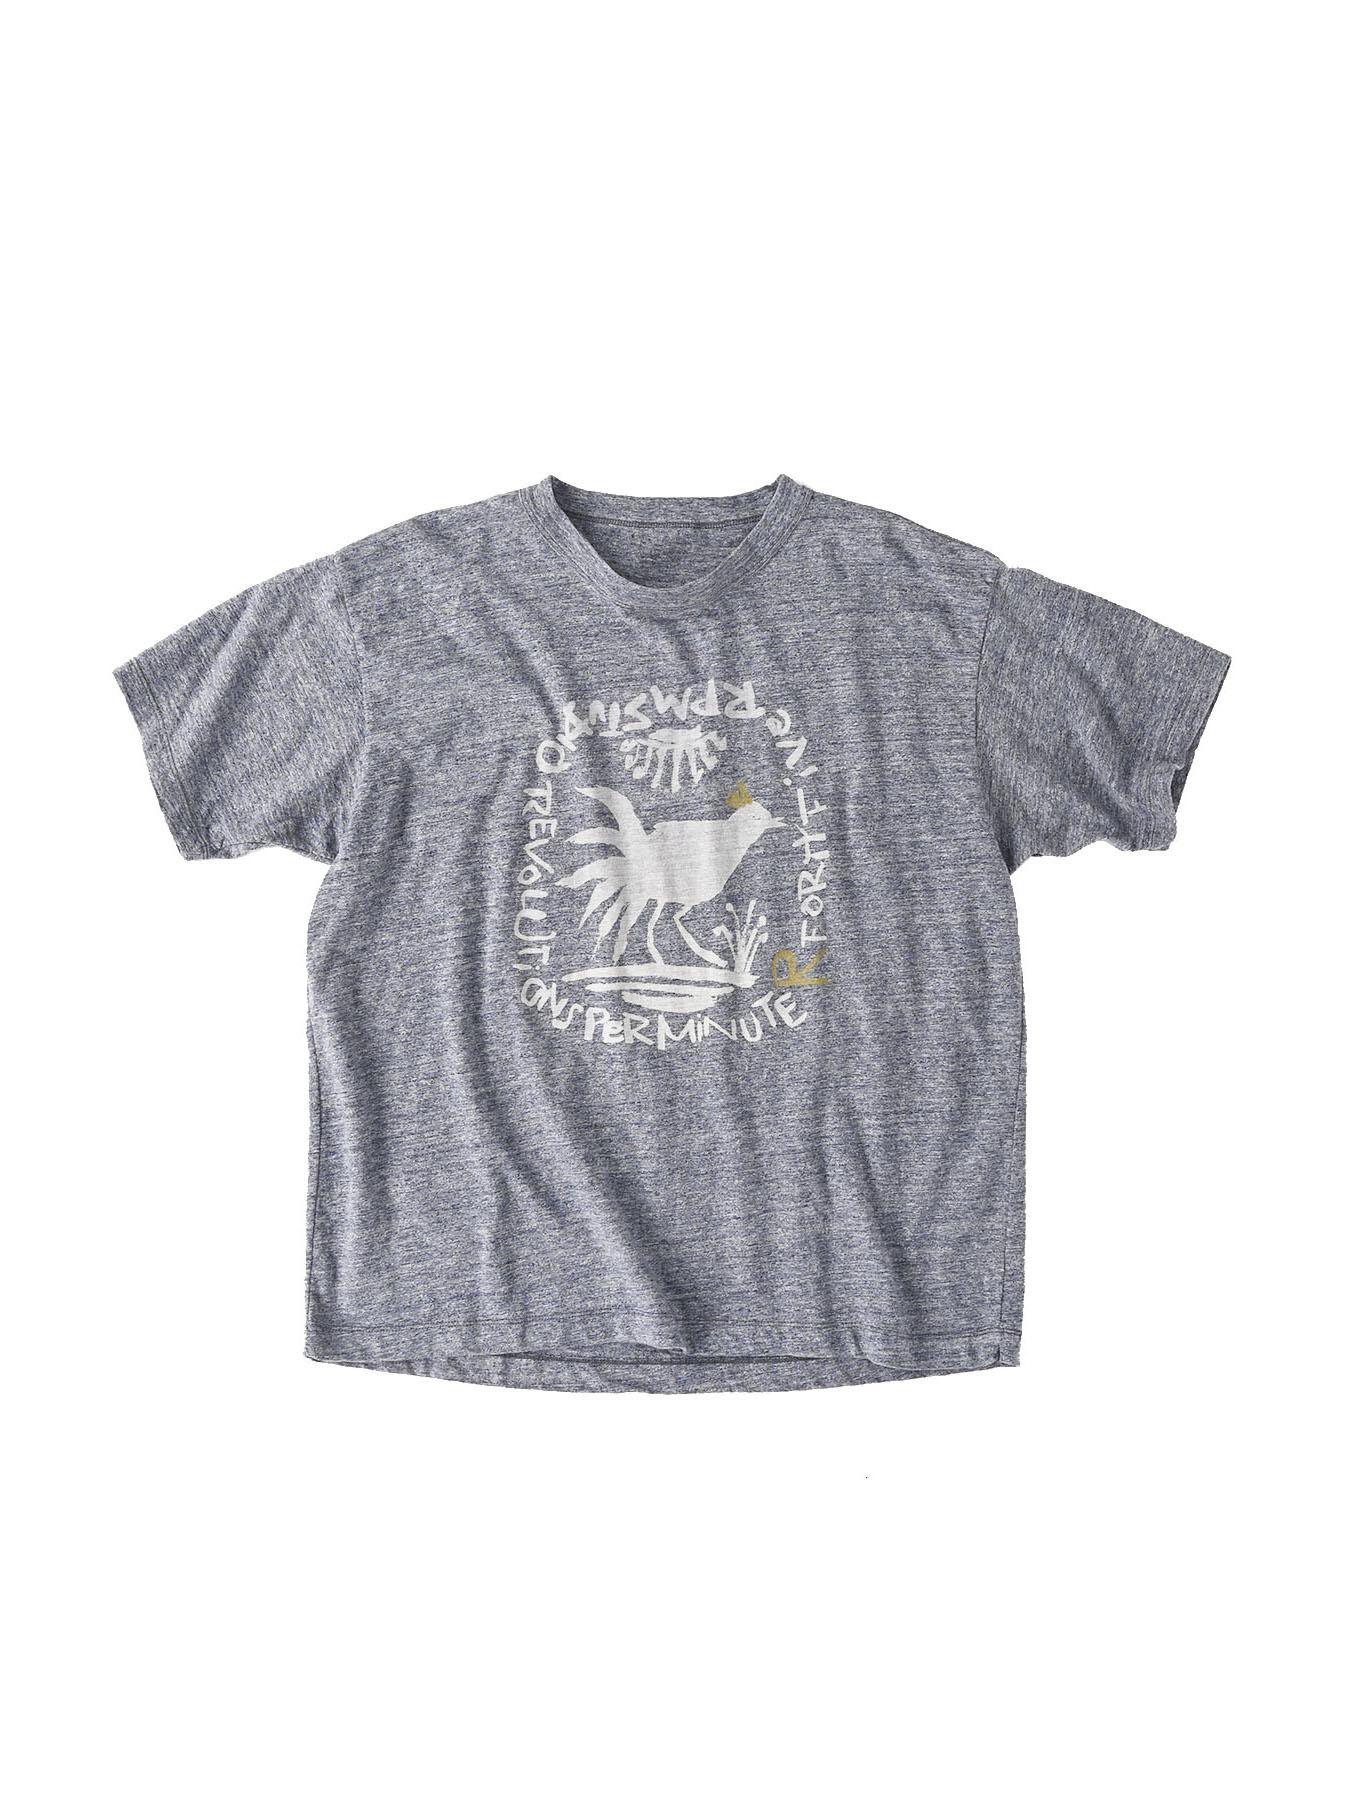 Top Sumite de Chicken T-shirt-1